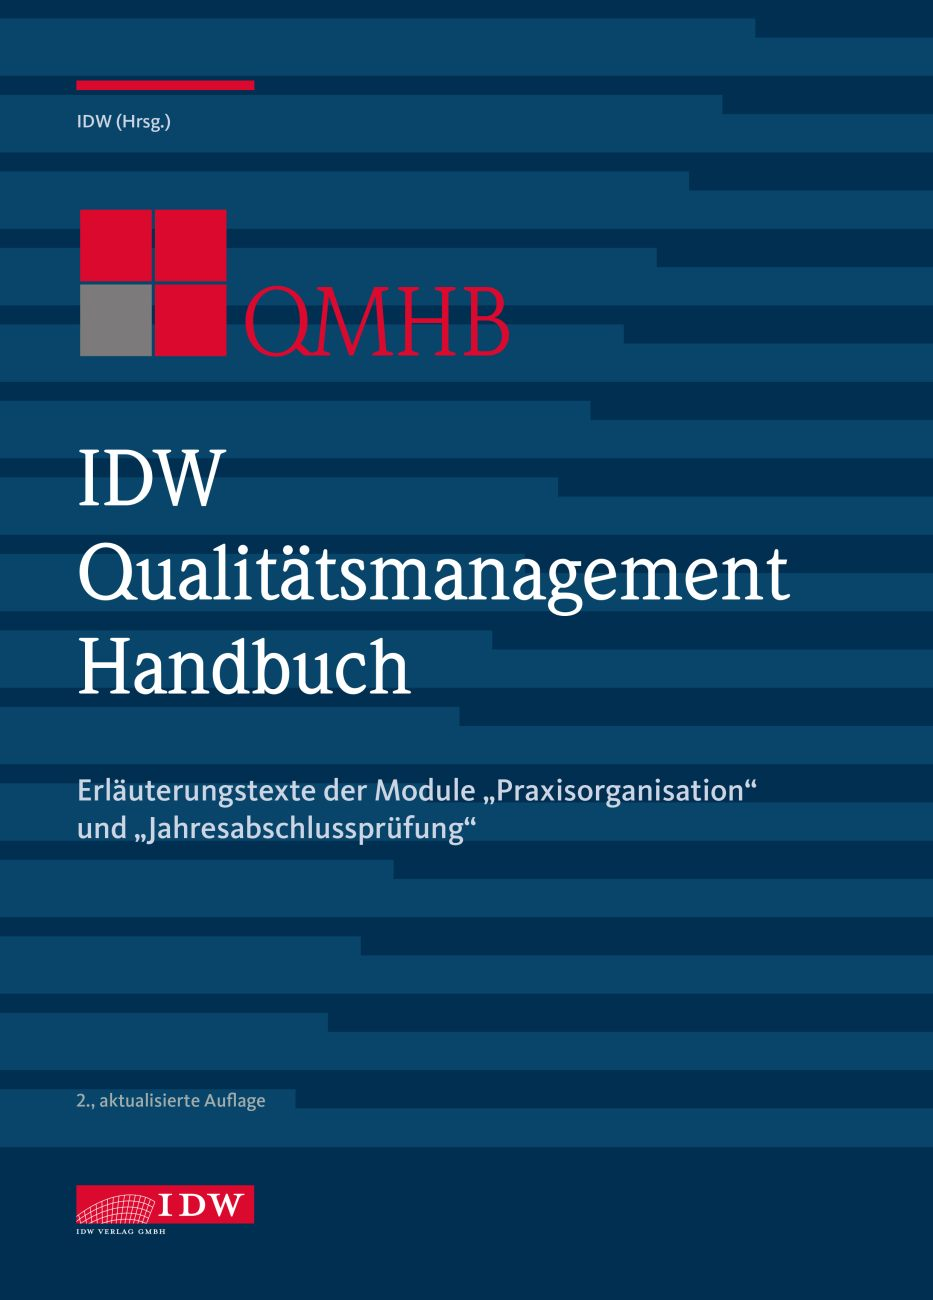 IDW Qualitätsmanagement Handbuch (QMHB) 2020-2021